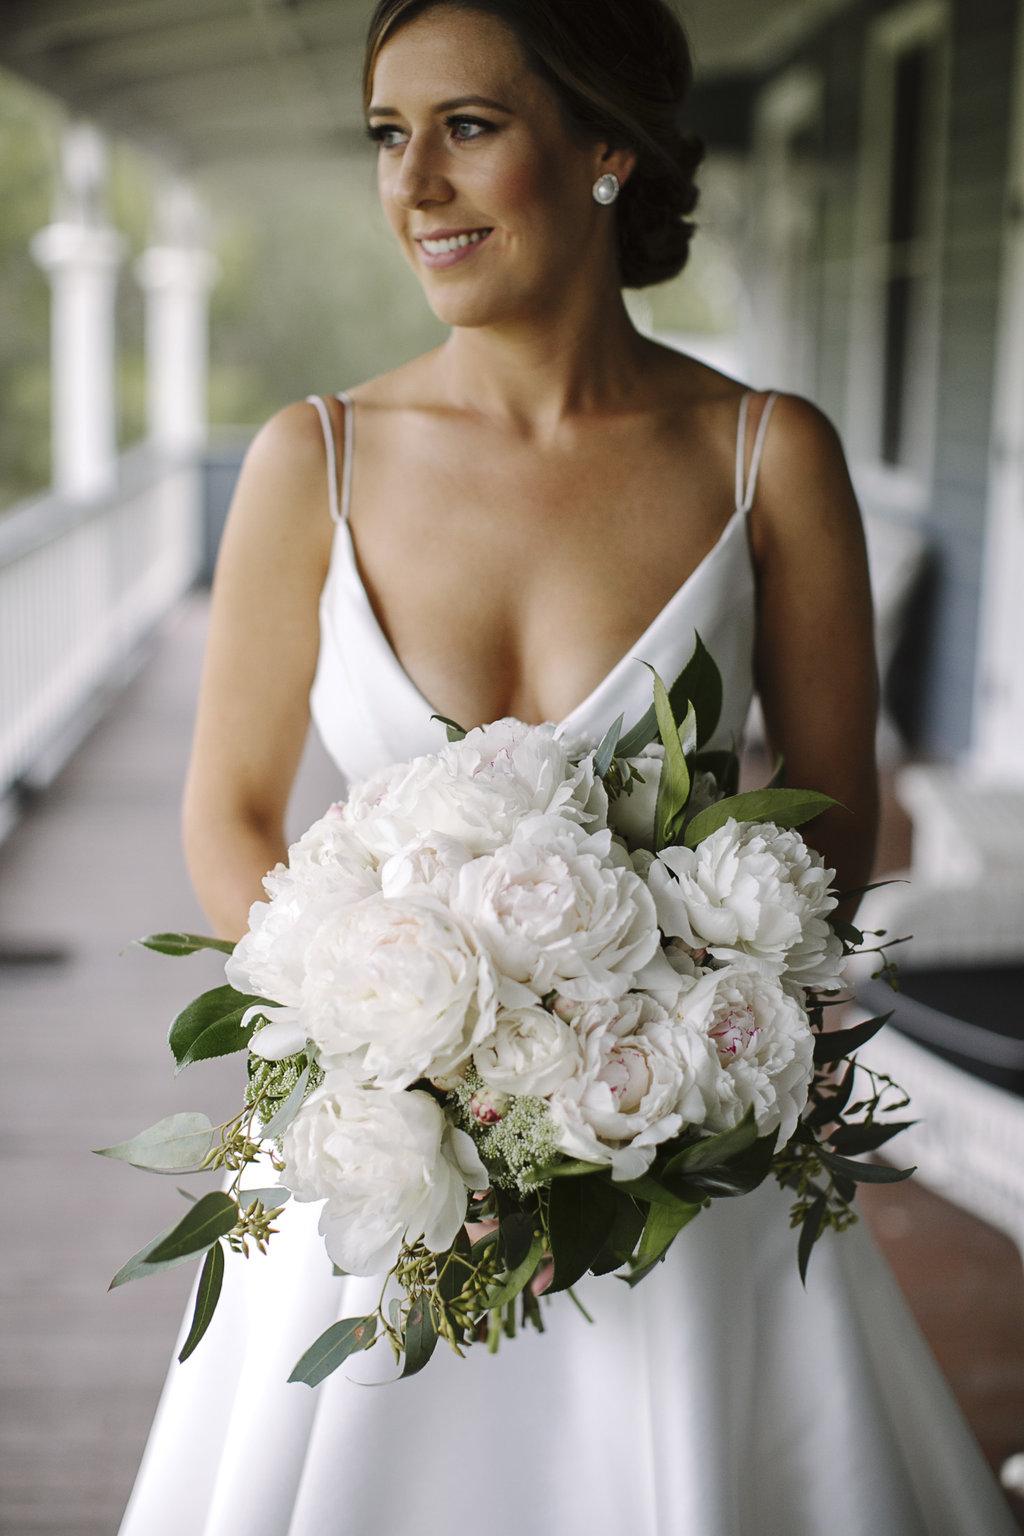 171118_justinaaron_wedding_danielle_michael_h-67.jpg